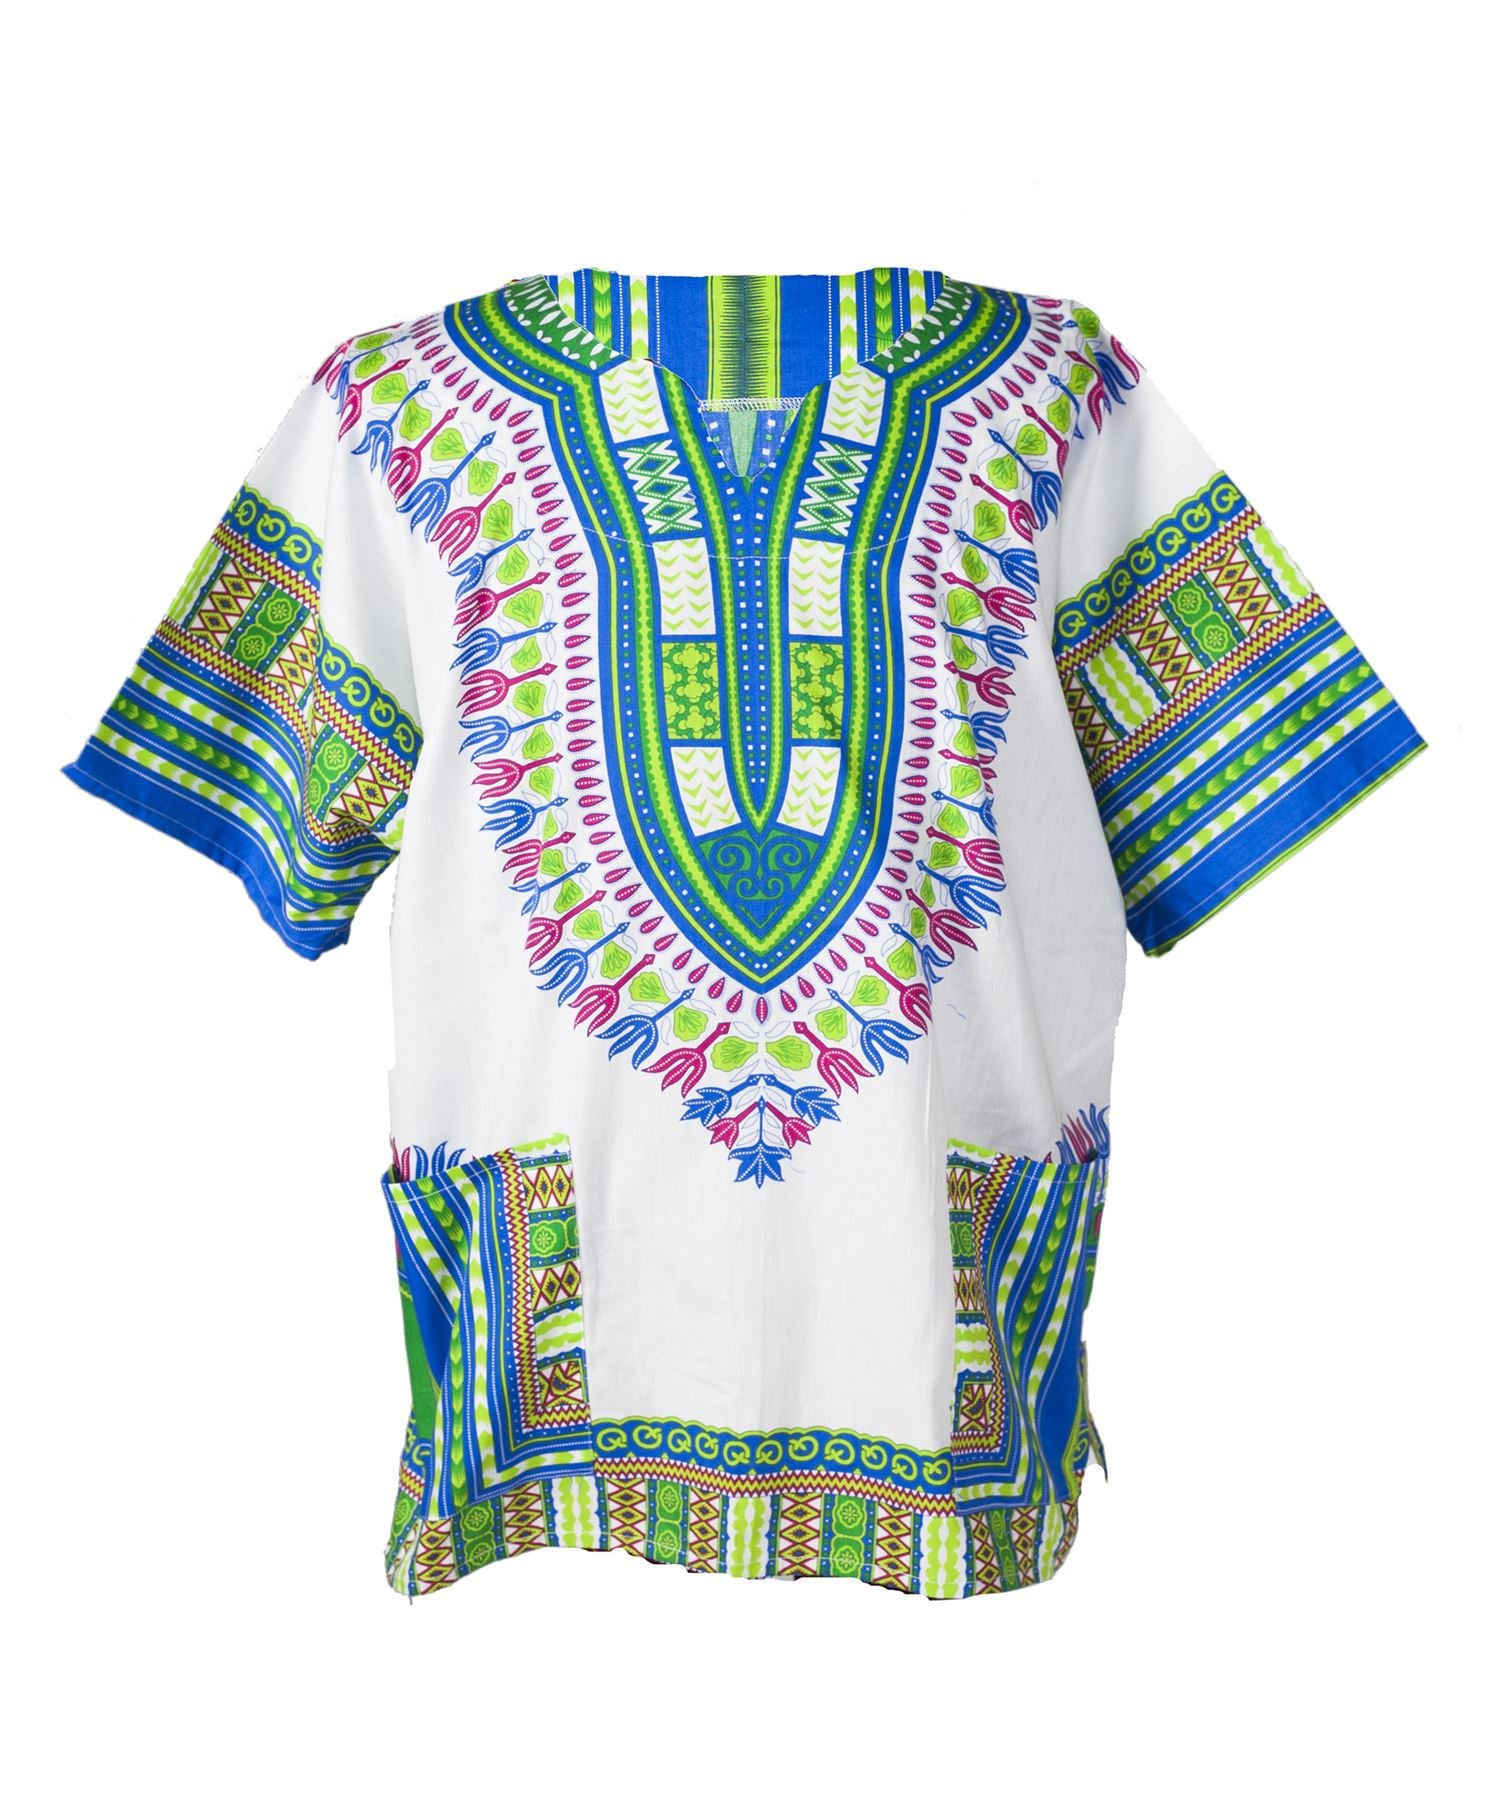 Lofbaz Traditional African Print Unisex Dashiki Size XXL White and Royal Blue